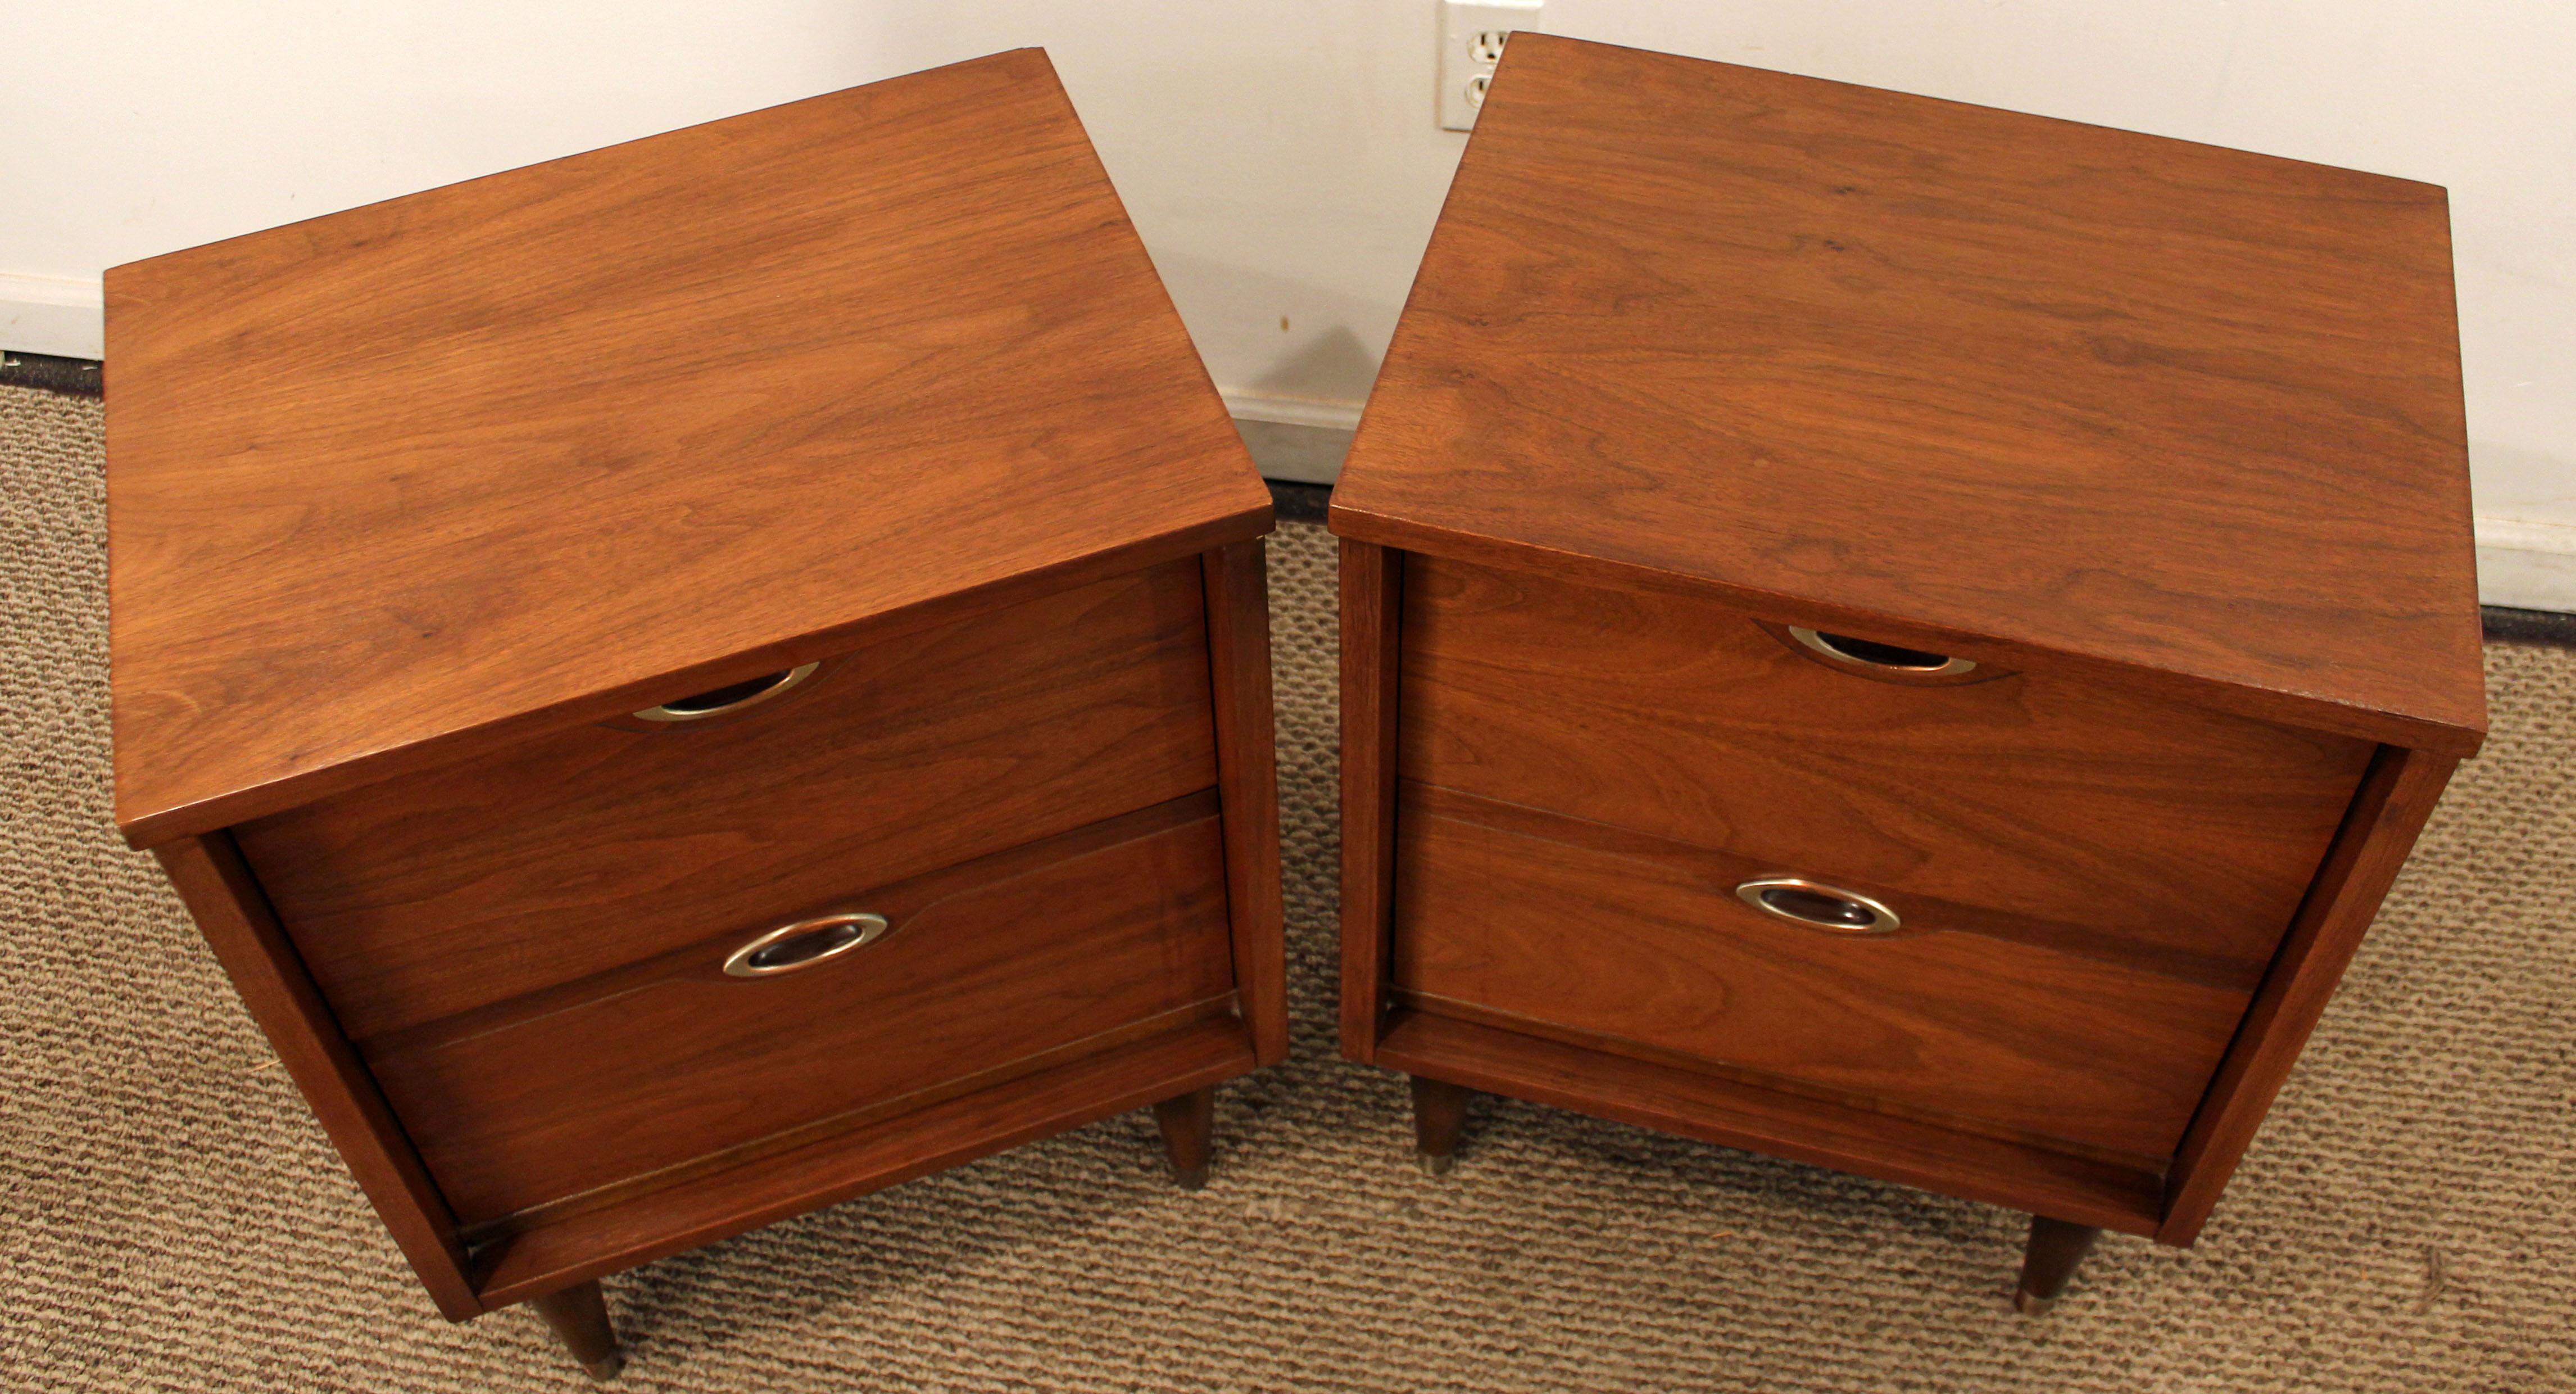 mainline by hooker midcentury danish modern walnut nightstands a pair image 4